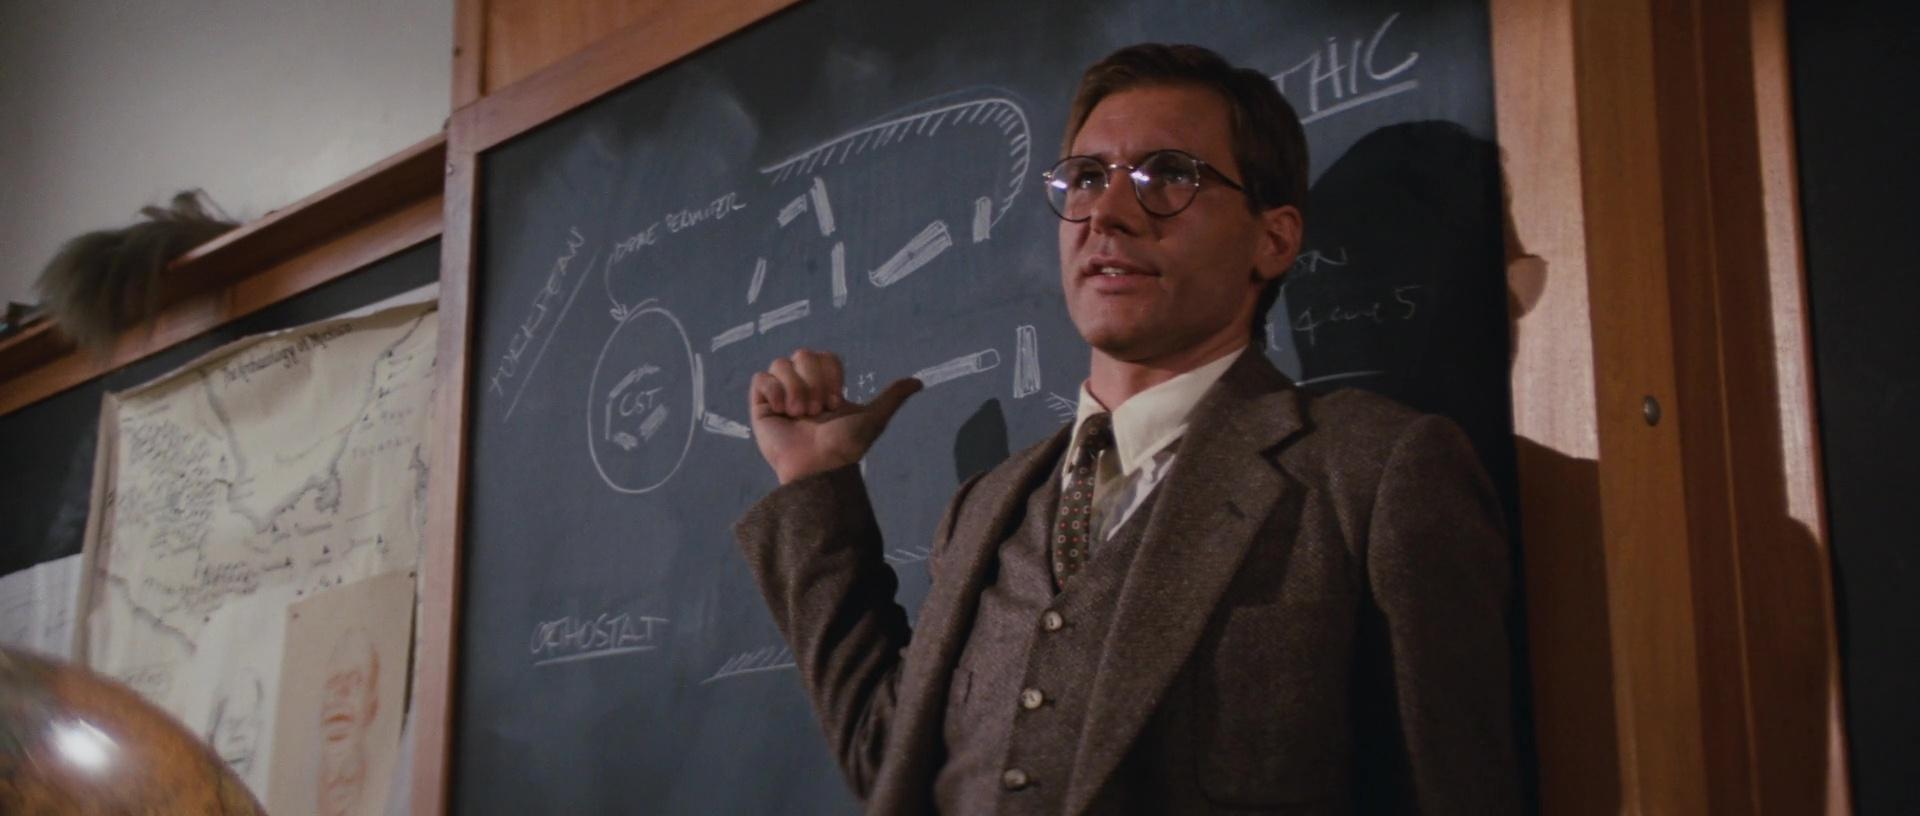 Marshall College Indiana Jones Wiki Fandom Powered By